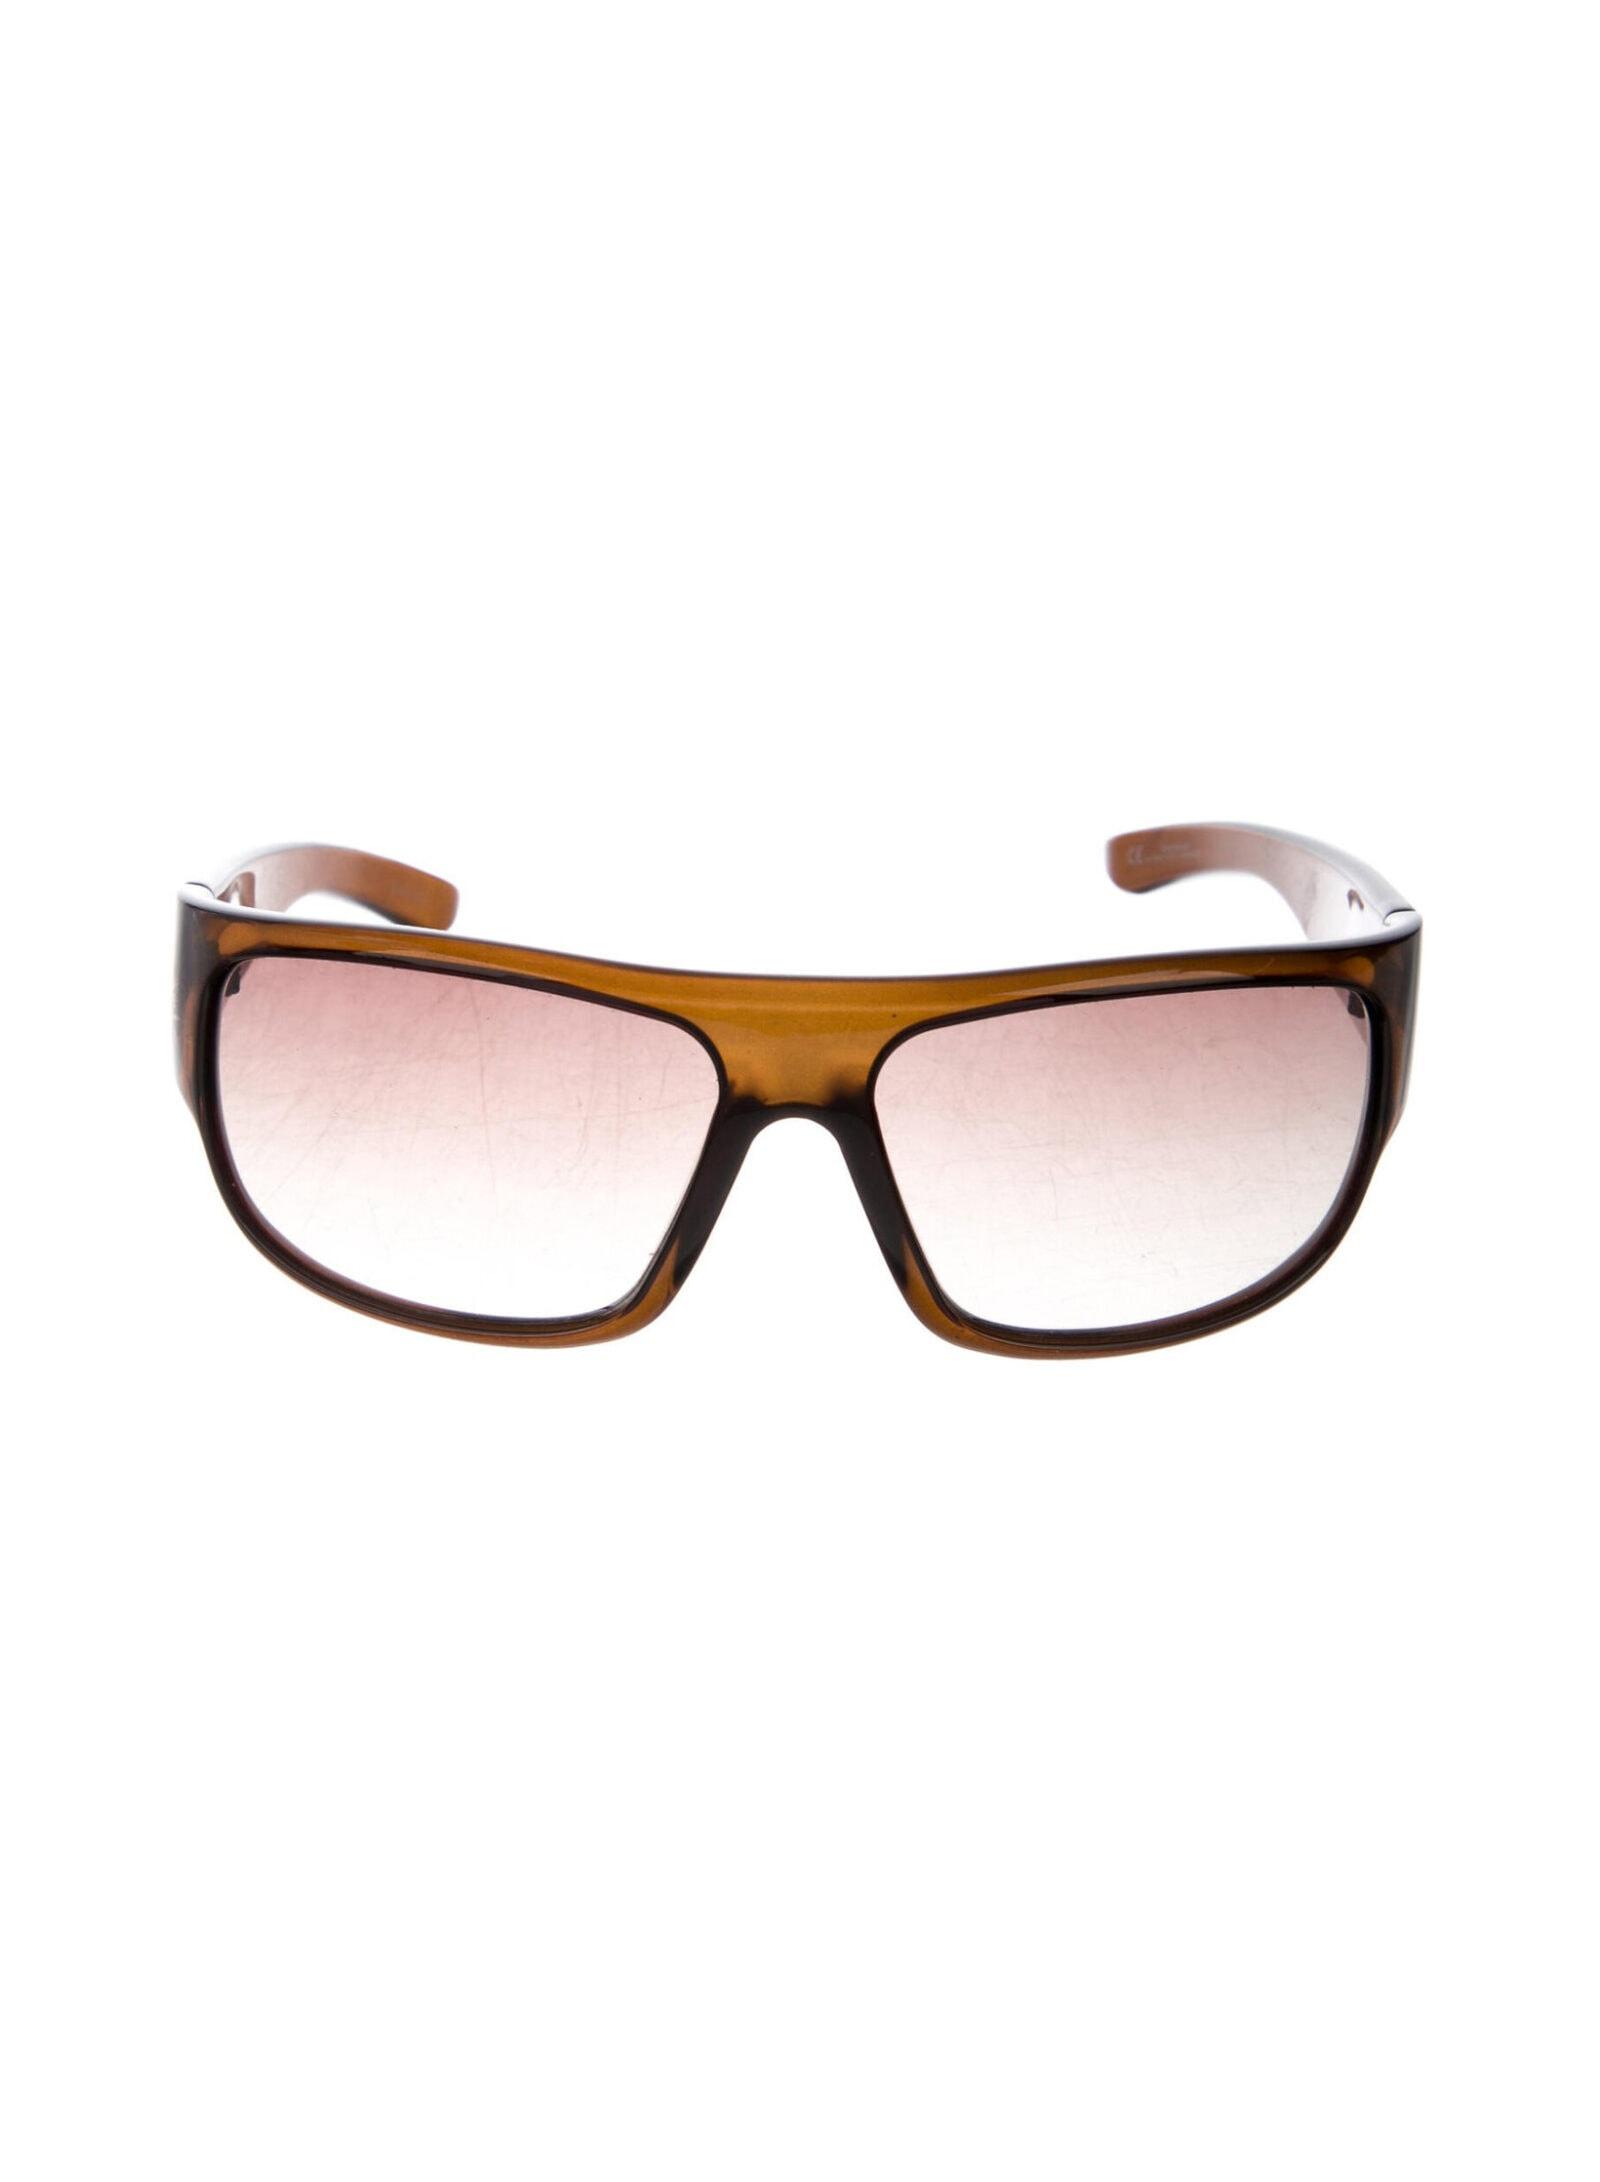 GUCCI Vintage Oversize Sunglasses